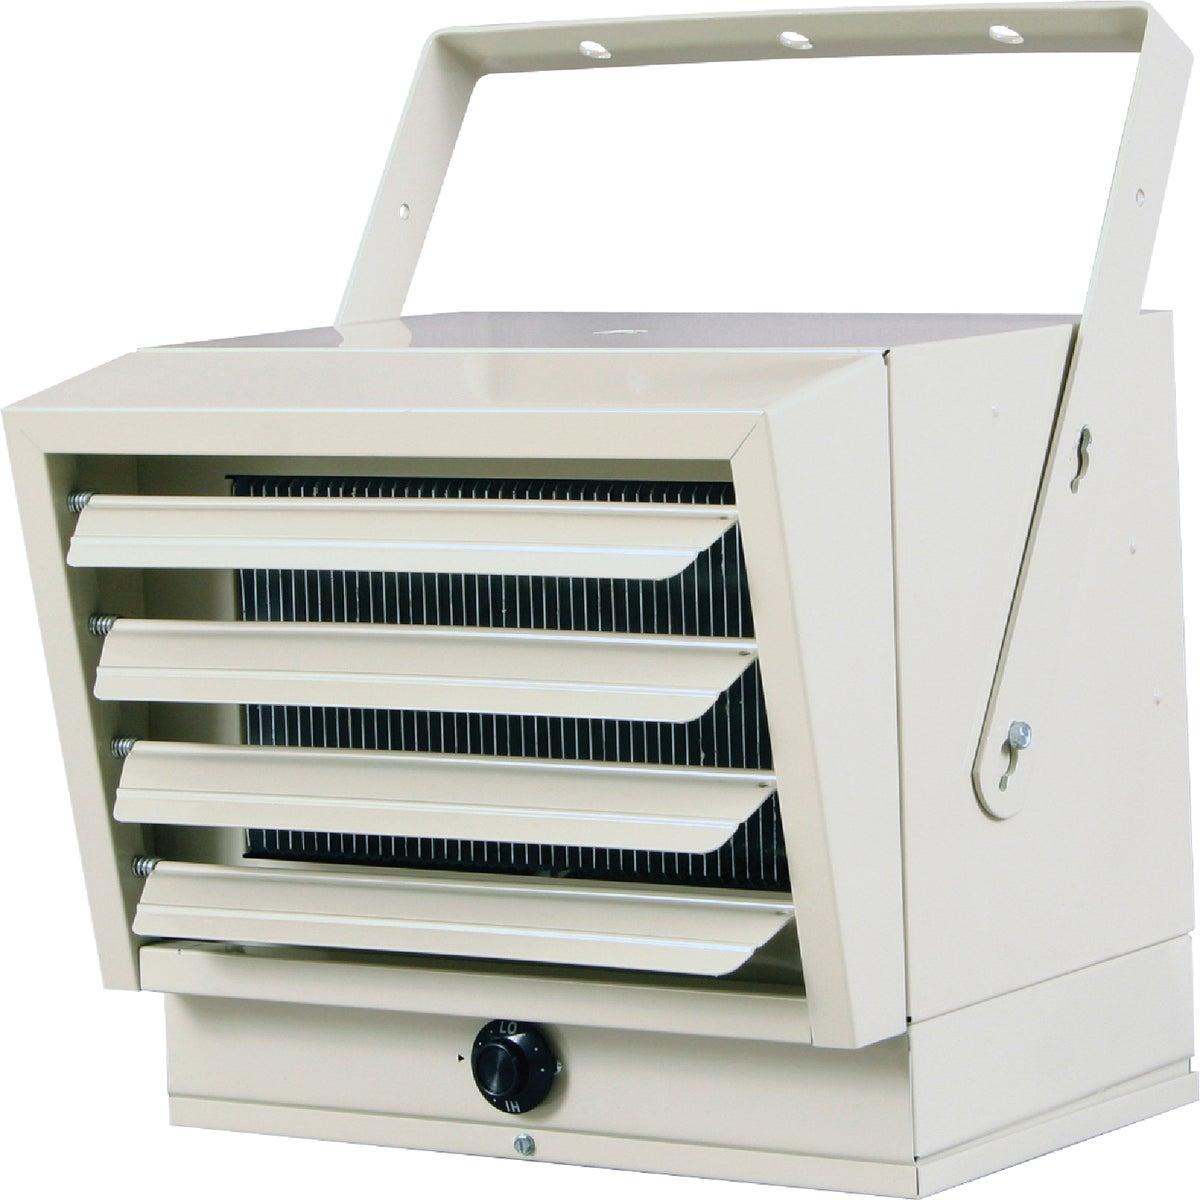 240V Garage Heater